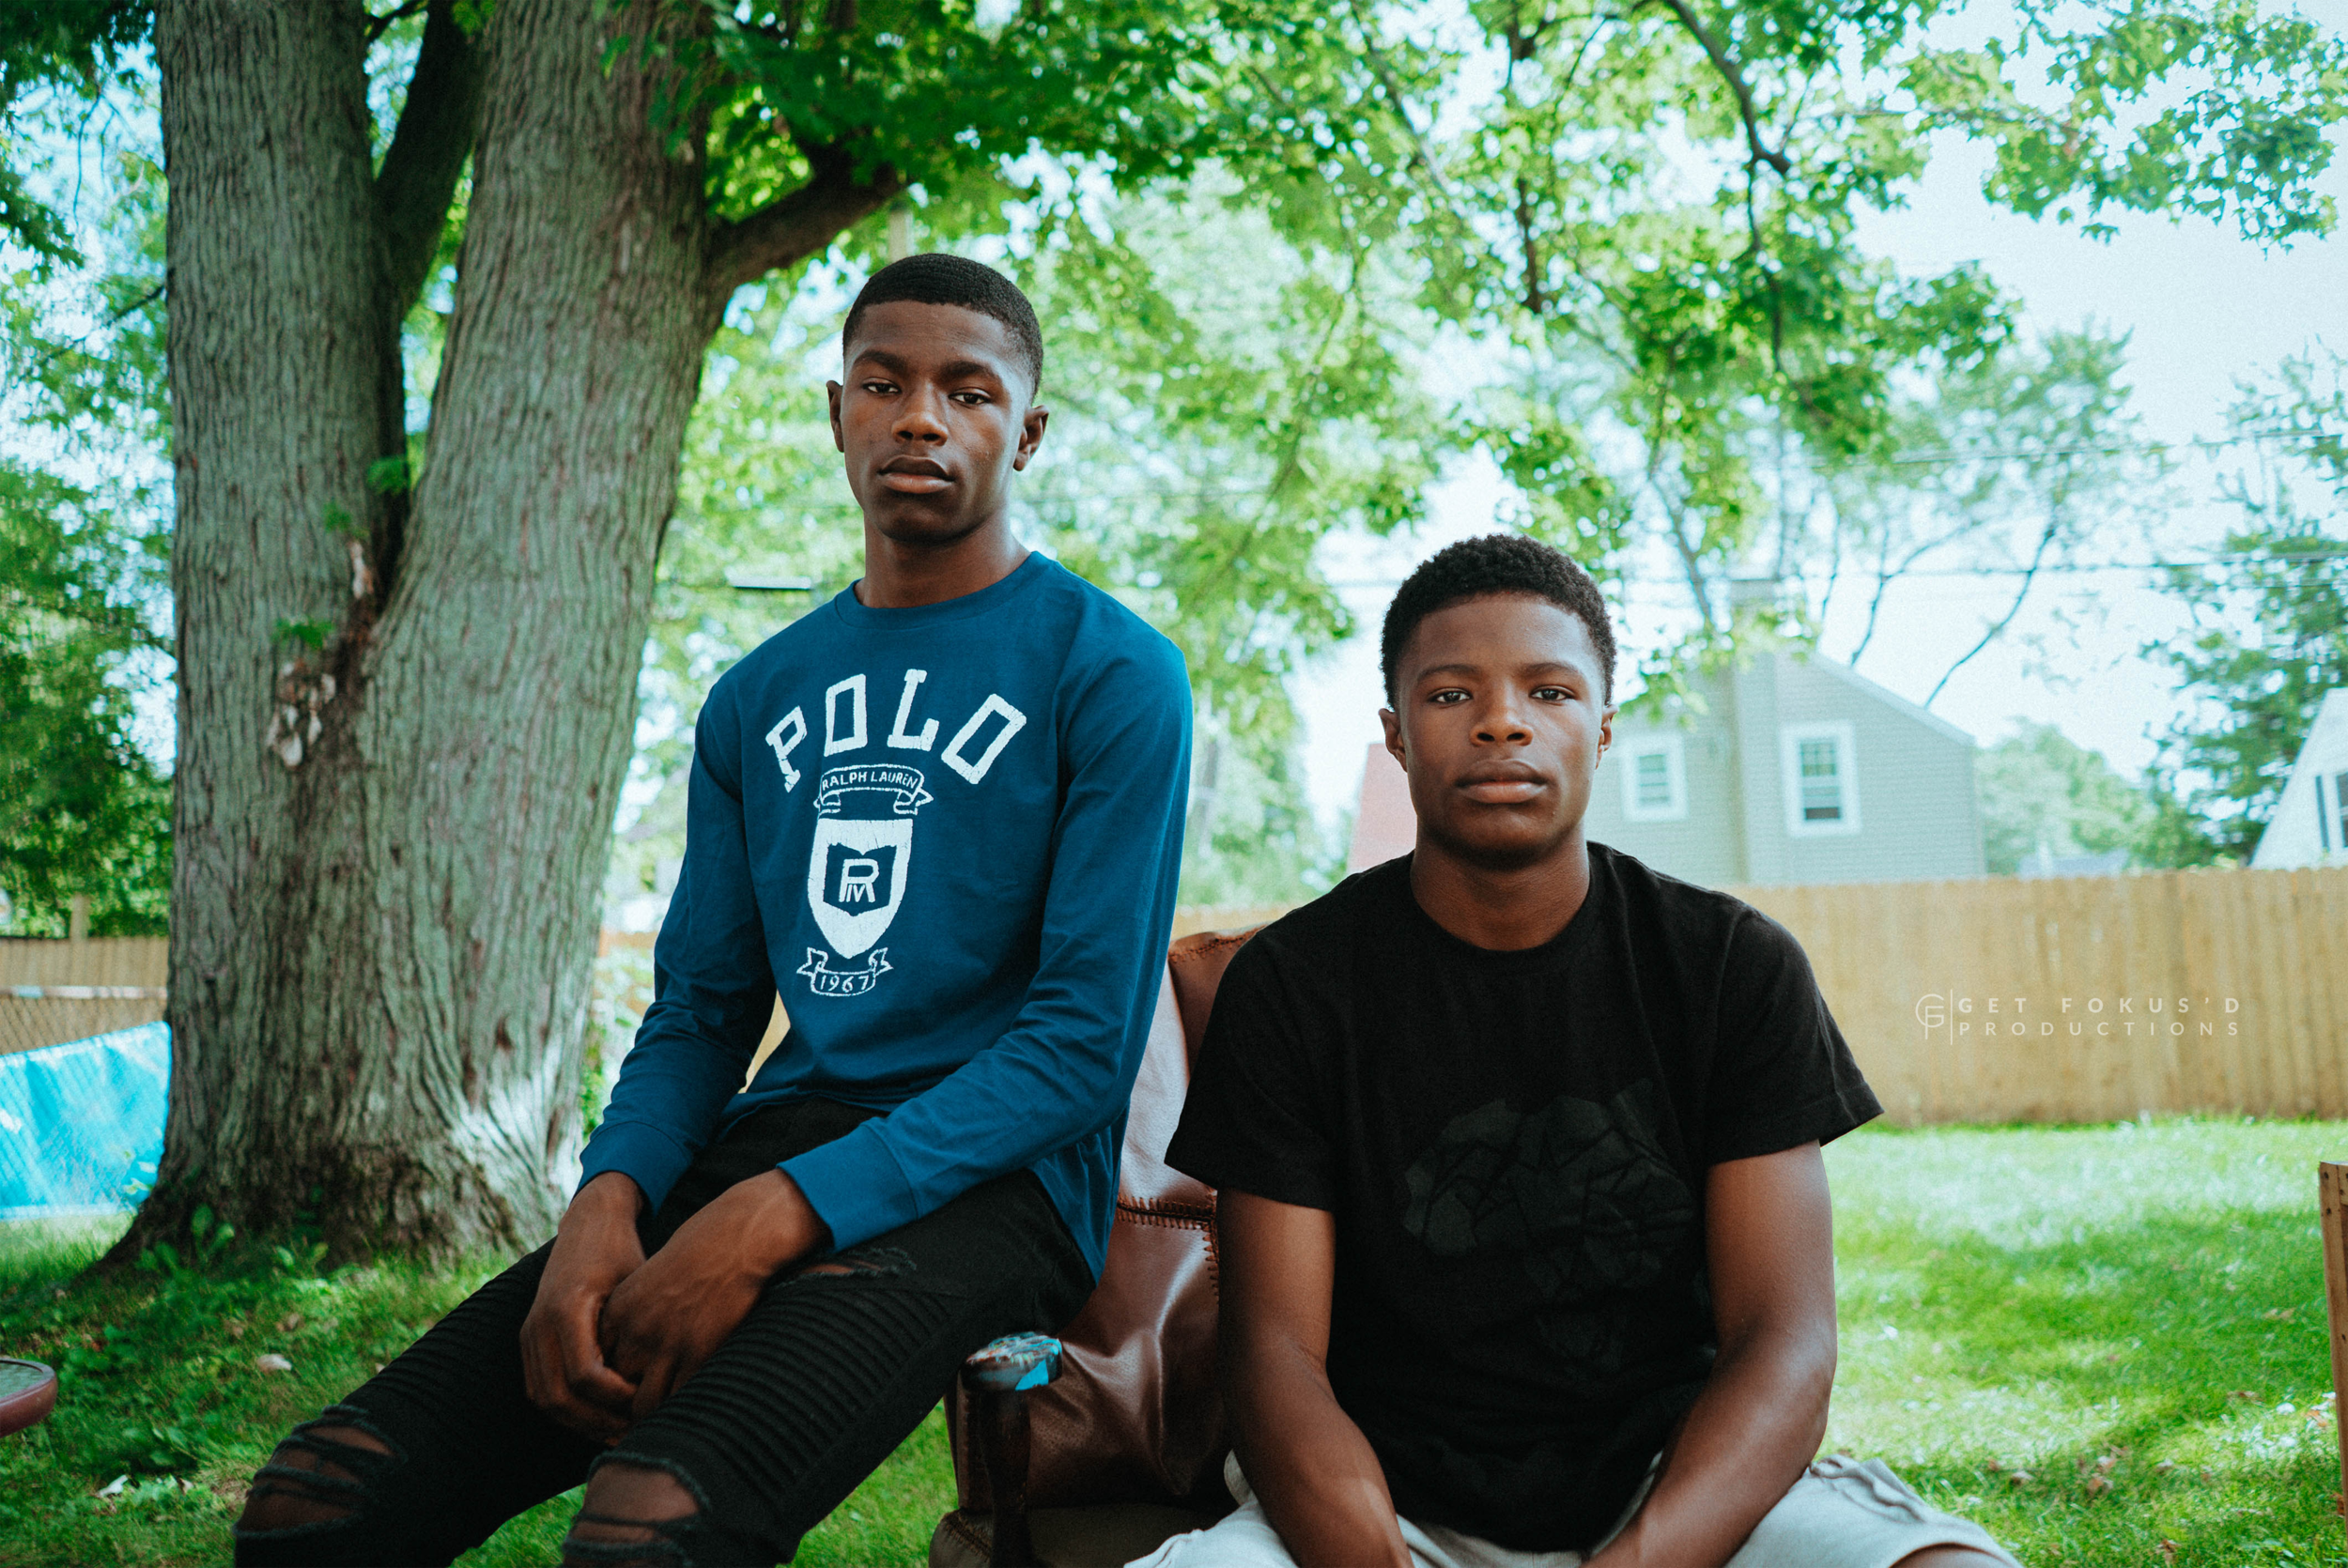 Emeka&Brother_WM.png